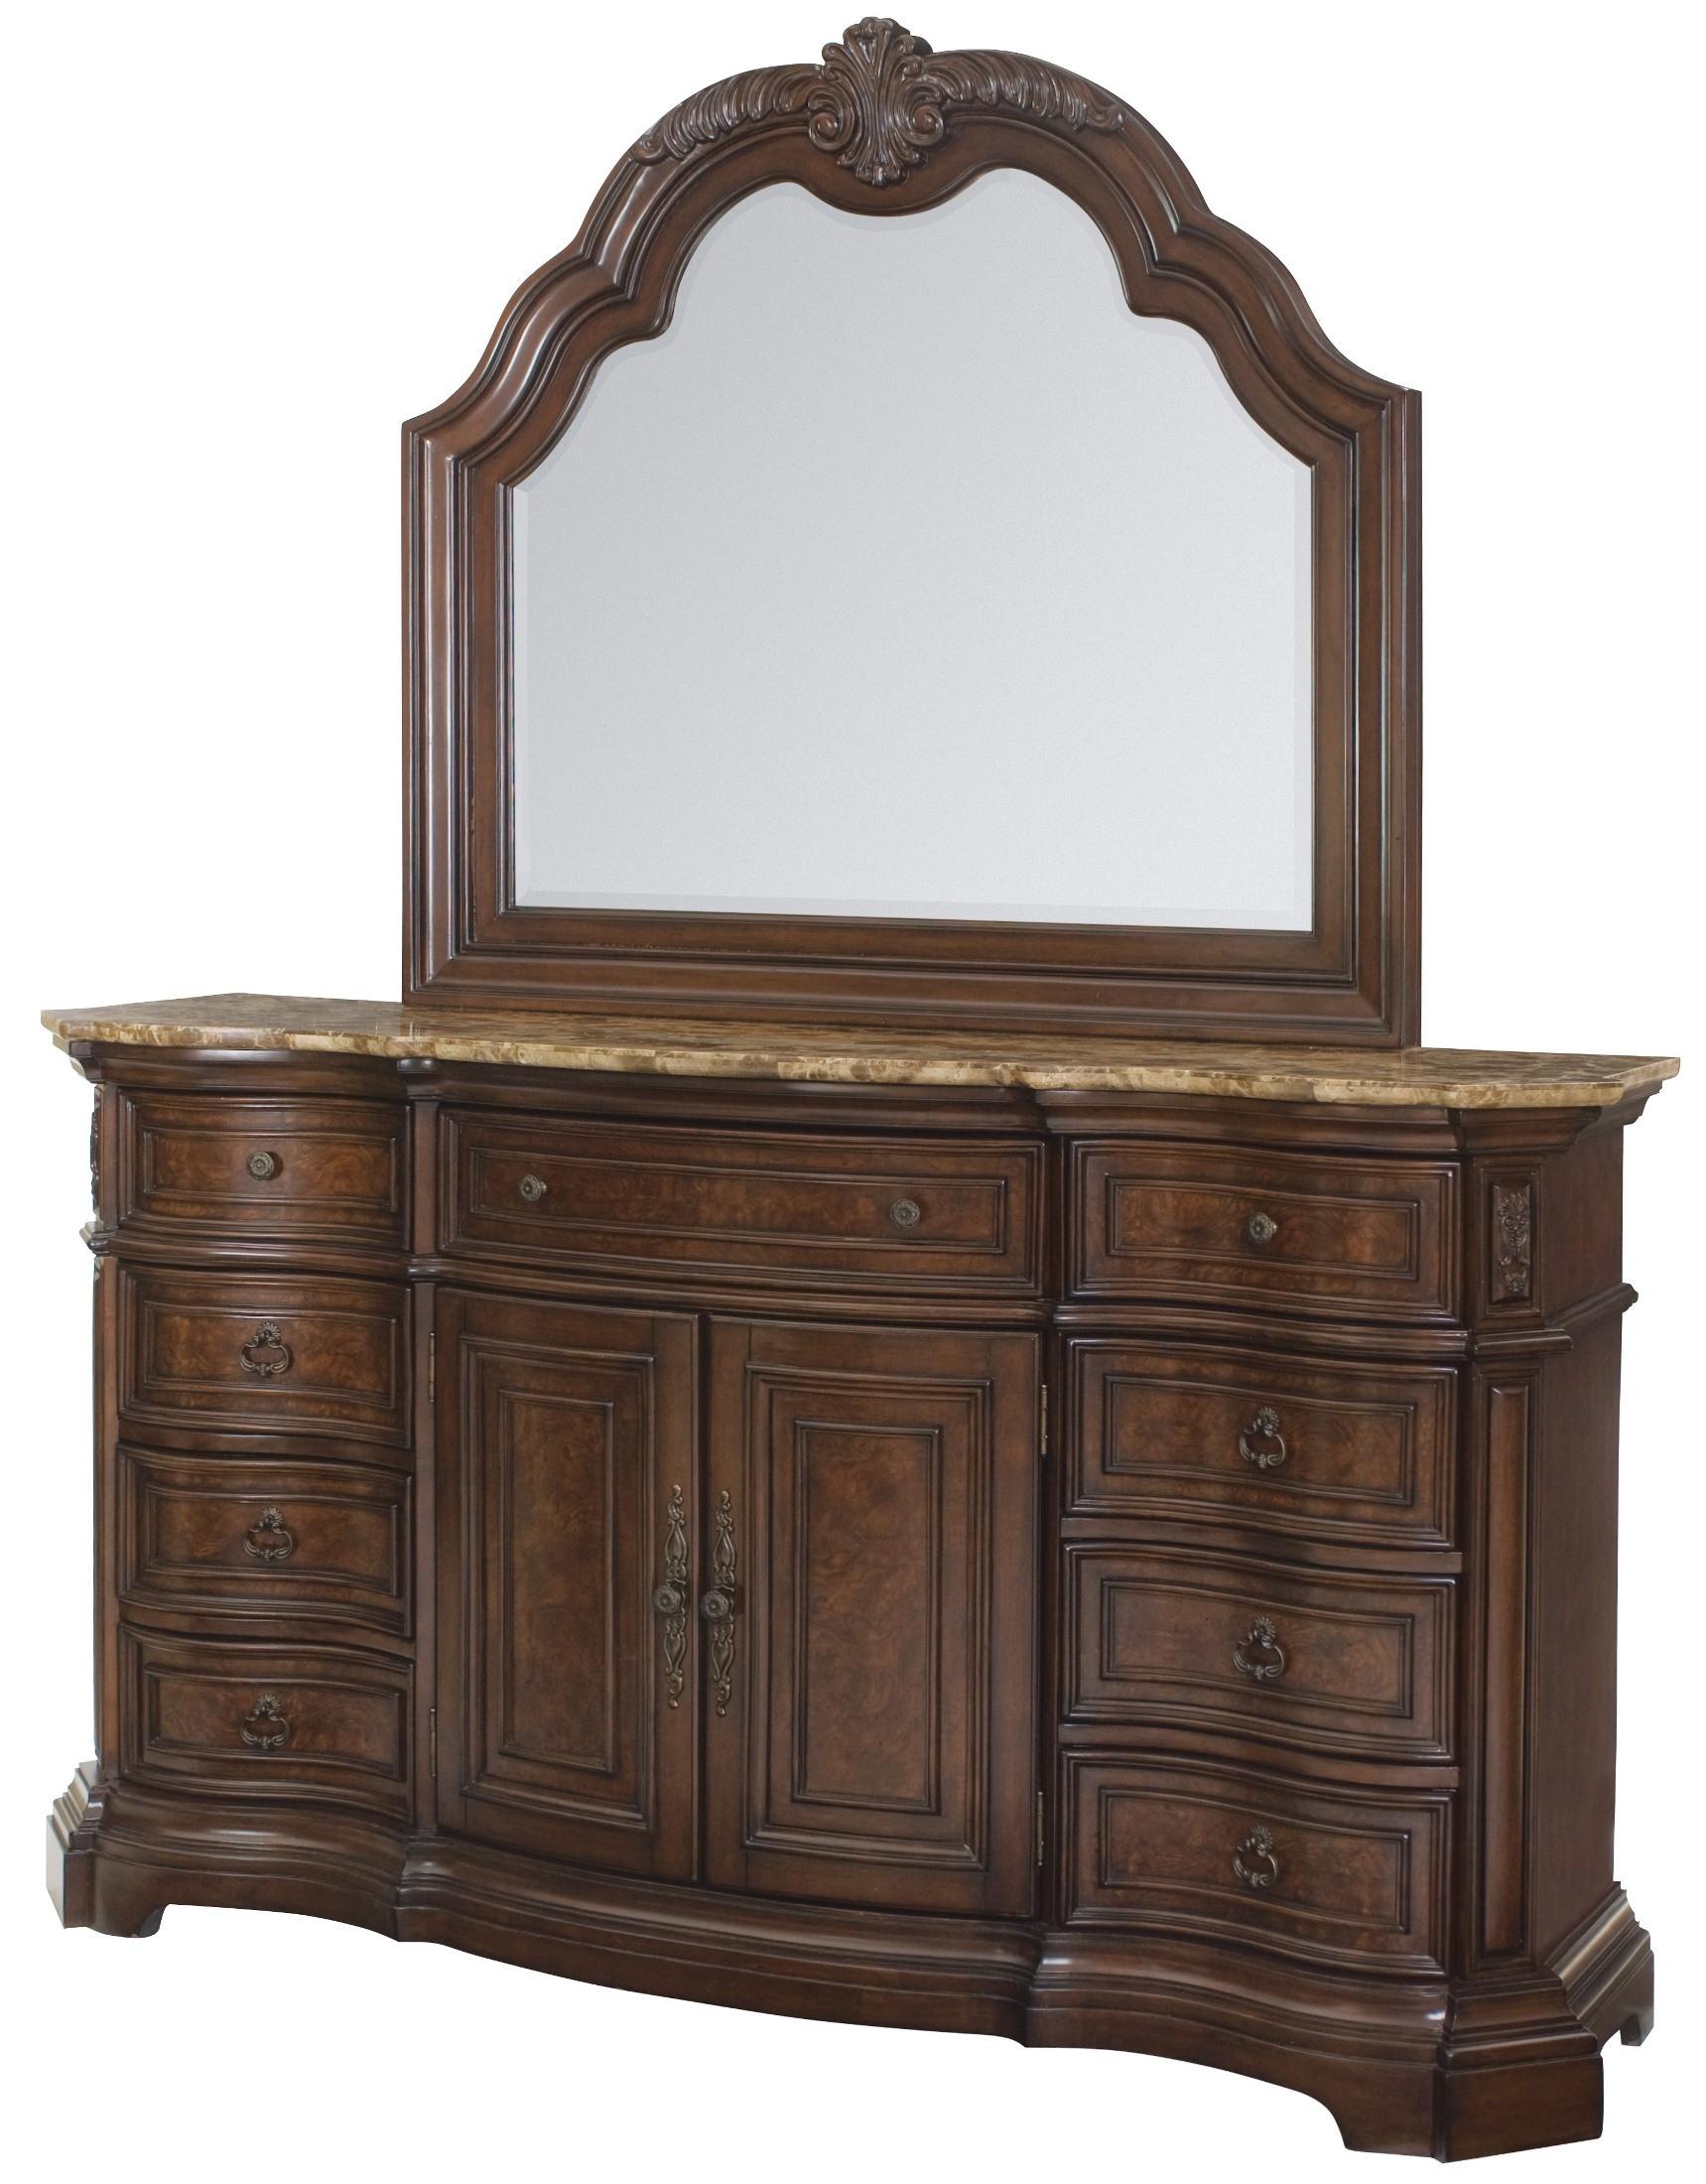 Edington Panel Bedroom Set from Samuel Lawrence (8328-252-259-508 ...